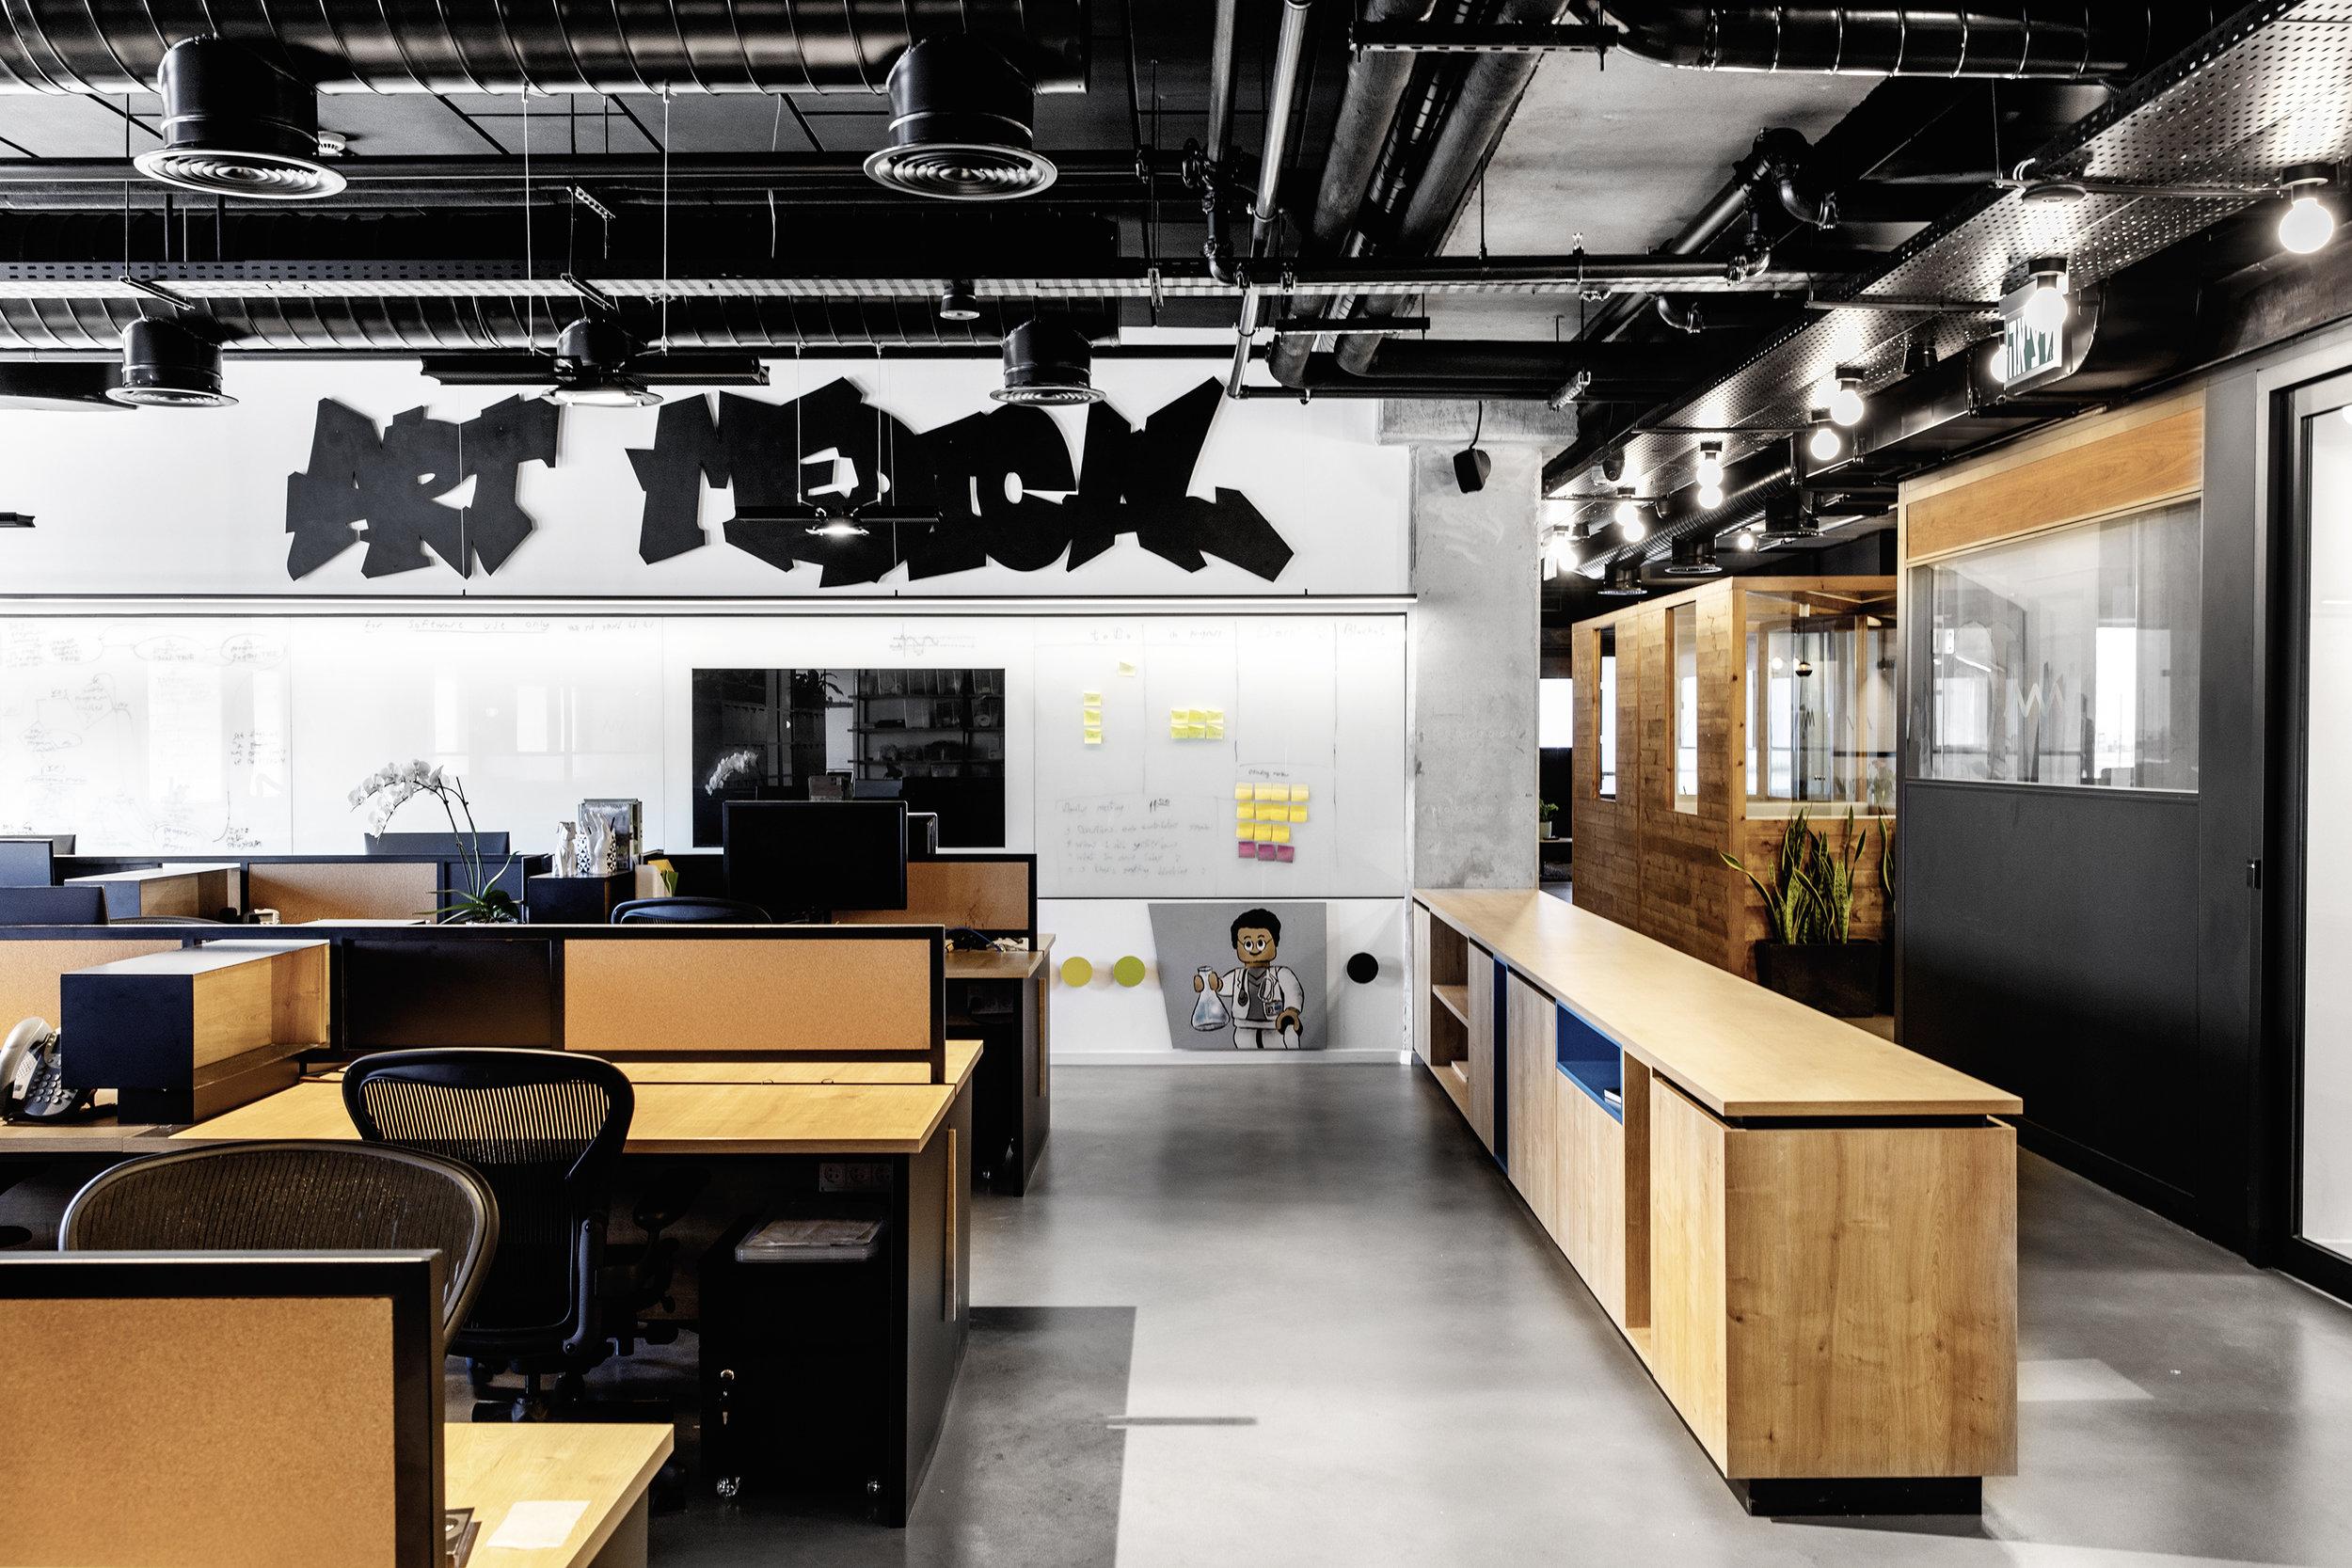 ROY DAVID ARCHITECTURE - STUDIO - ART MEDICAL OFFICES - רואי דוד אדריכלים - סטודיו רואי דוד - אדריכלות - ארט מדיקל (24).jpg